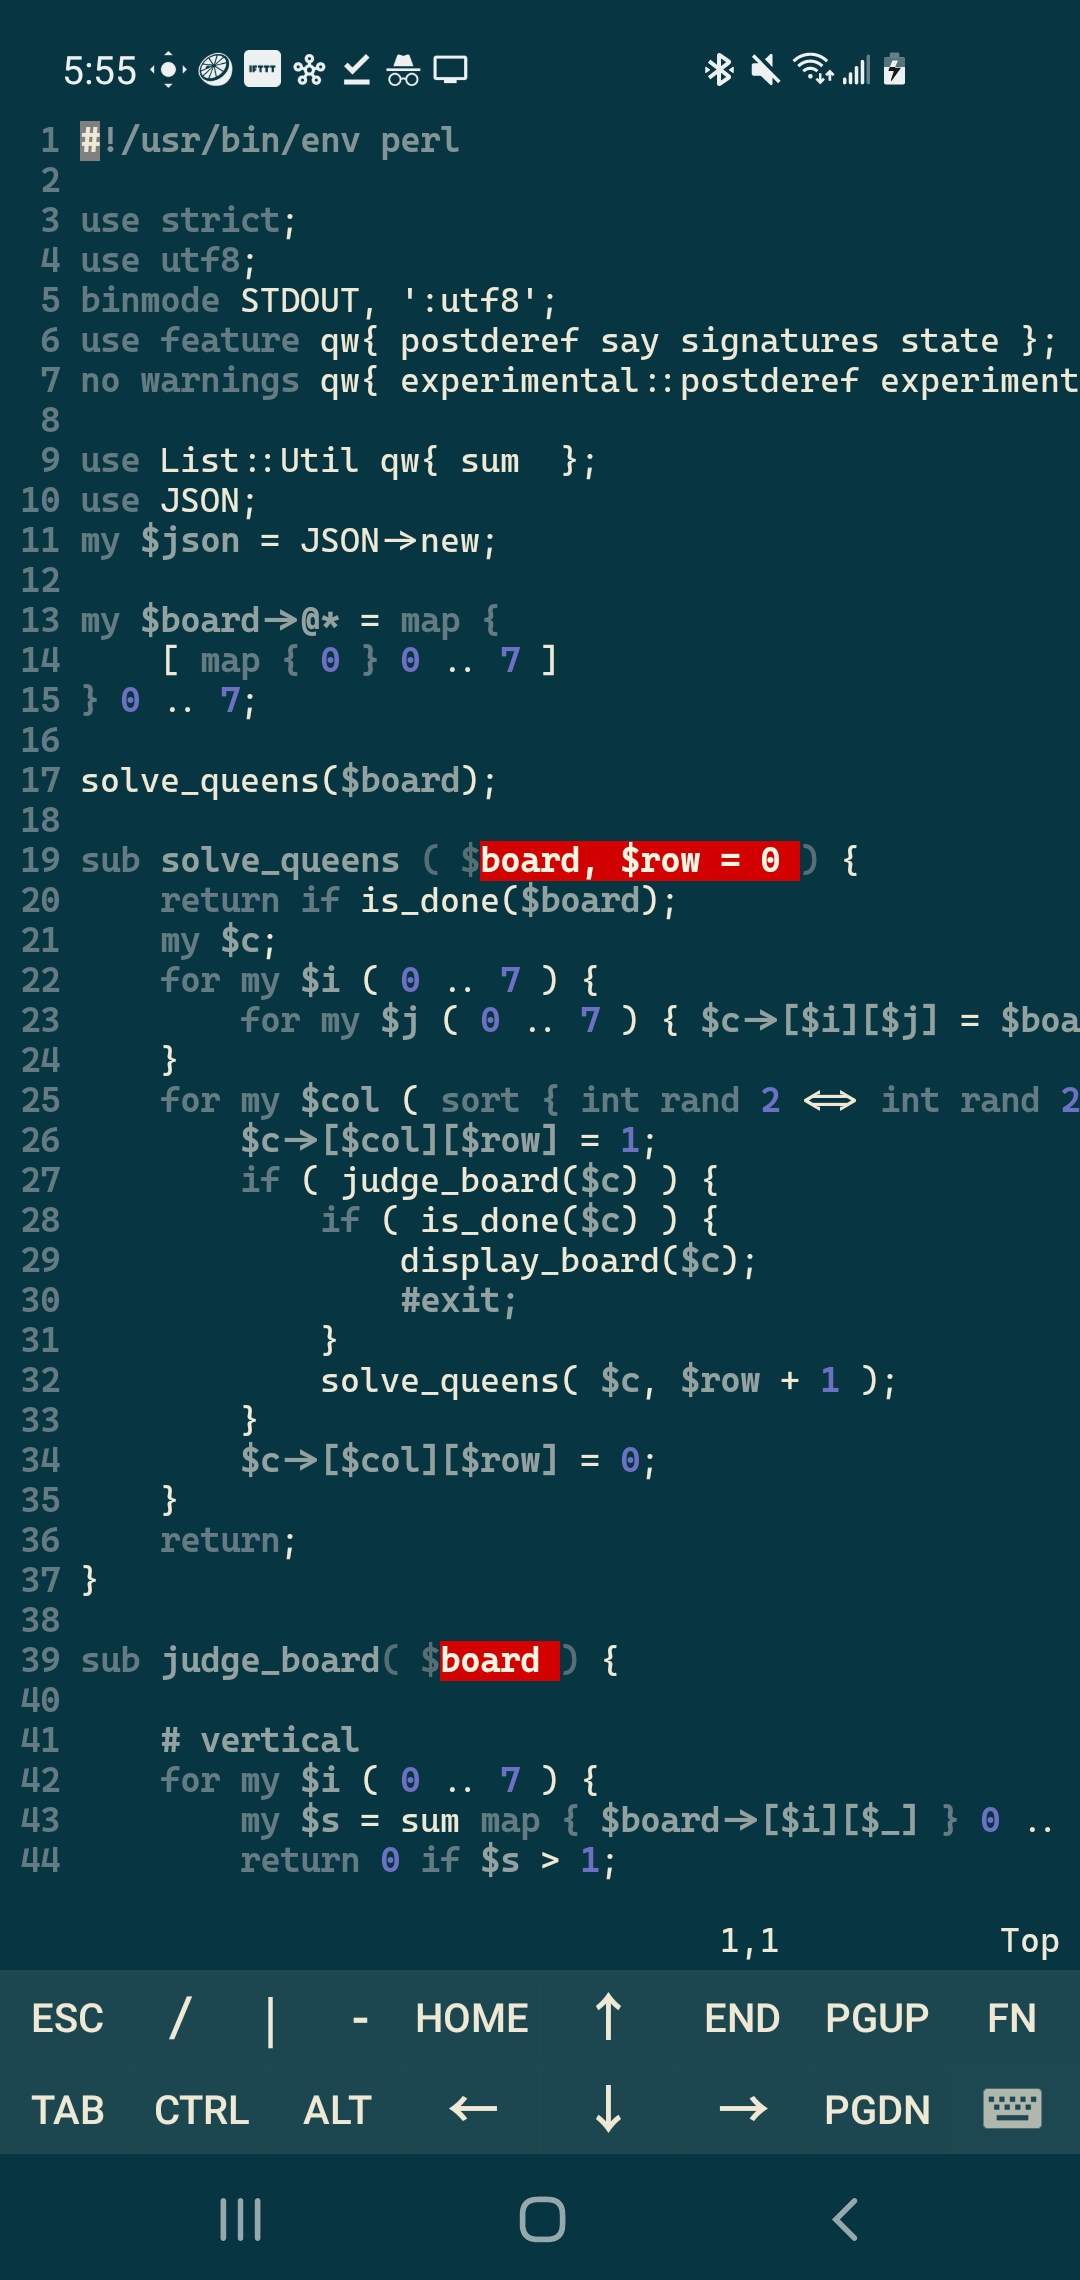 My Code on a remote machine via JuiceSSH